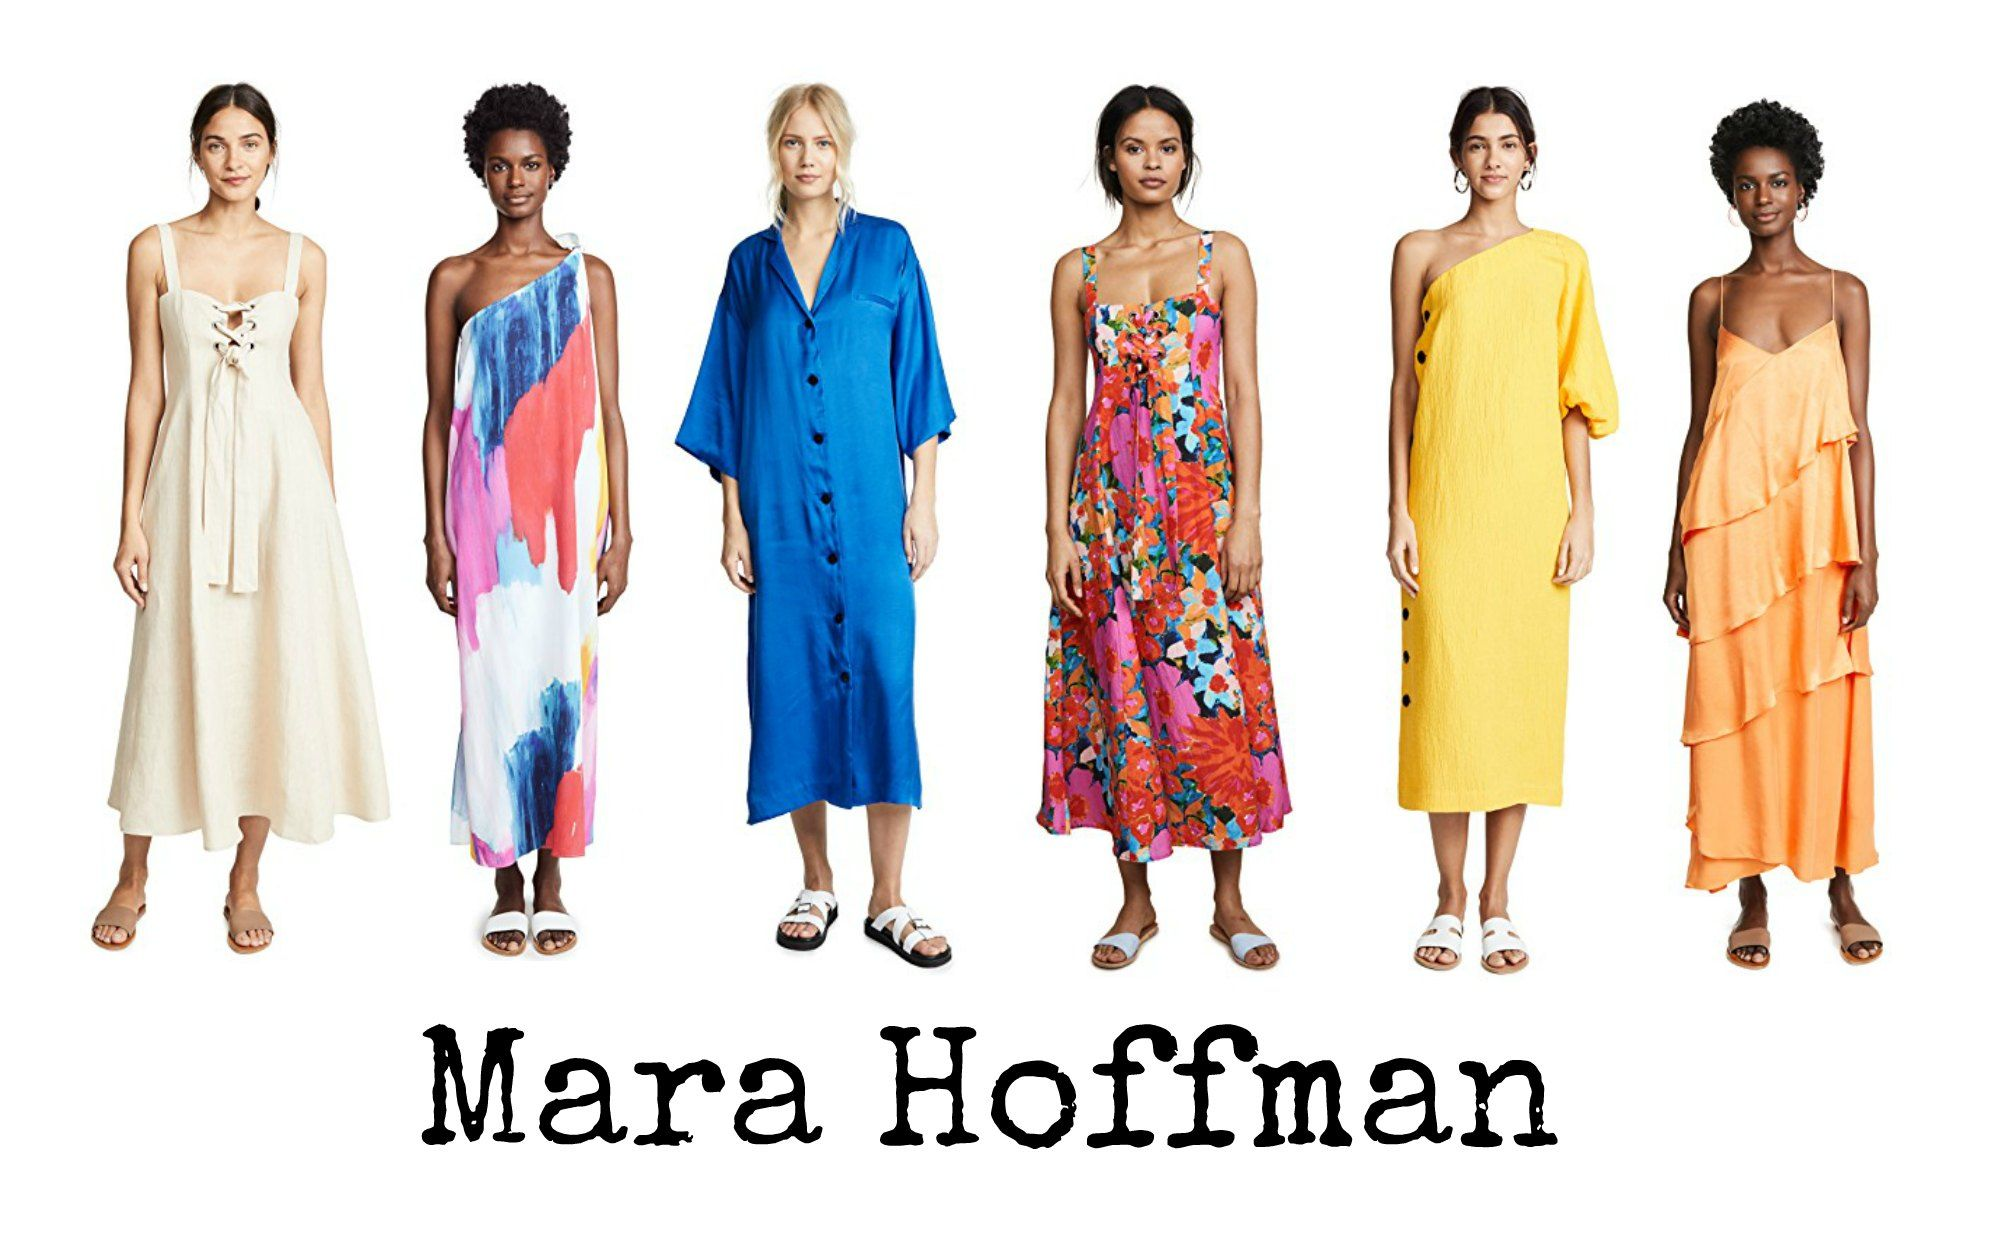 Mara Hoffman Shopbop